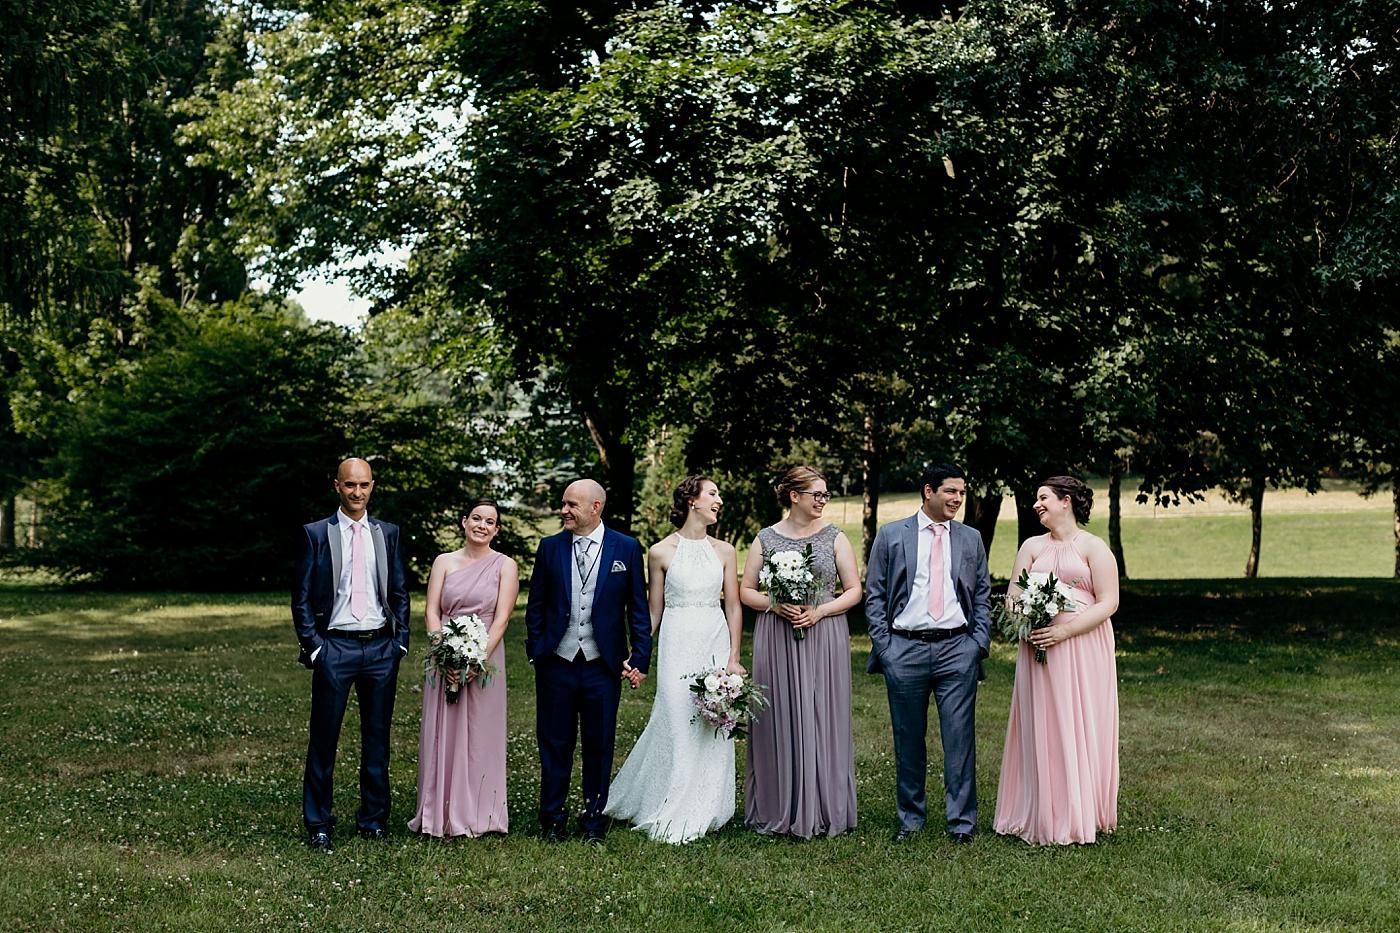 Chateau-Michelle-Wedding-Julia+JuanLuis_TheHeartlandersCo2018LA-174.jpg